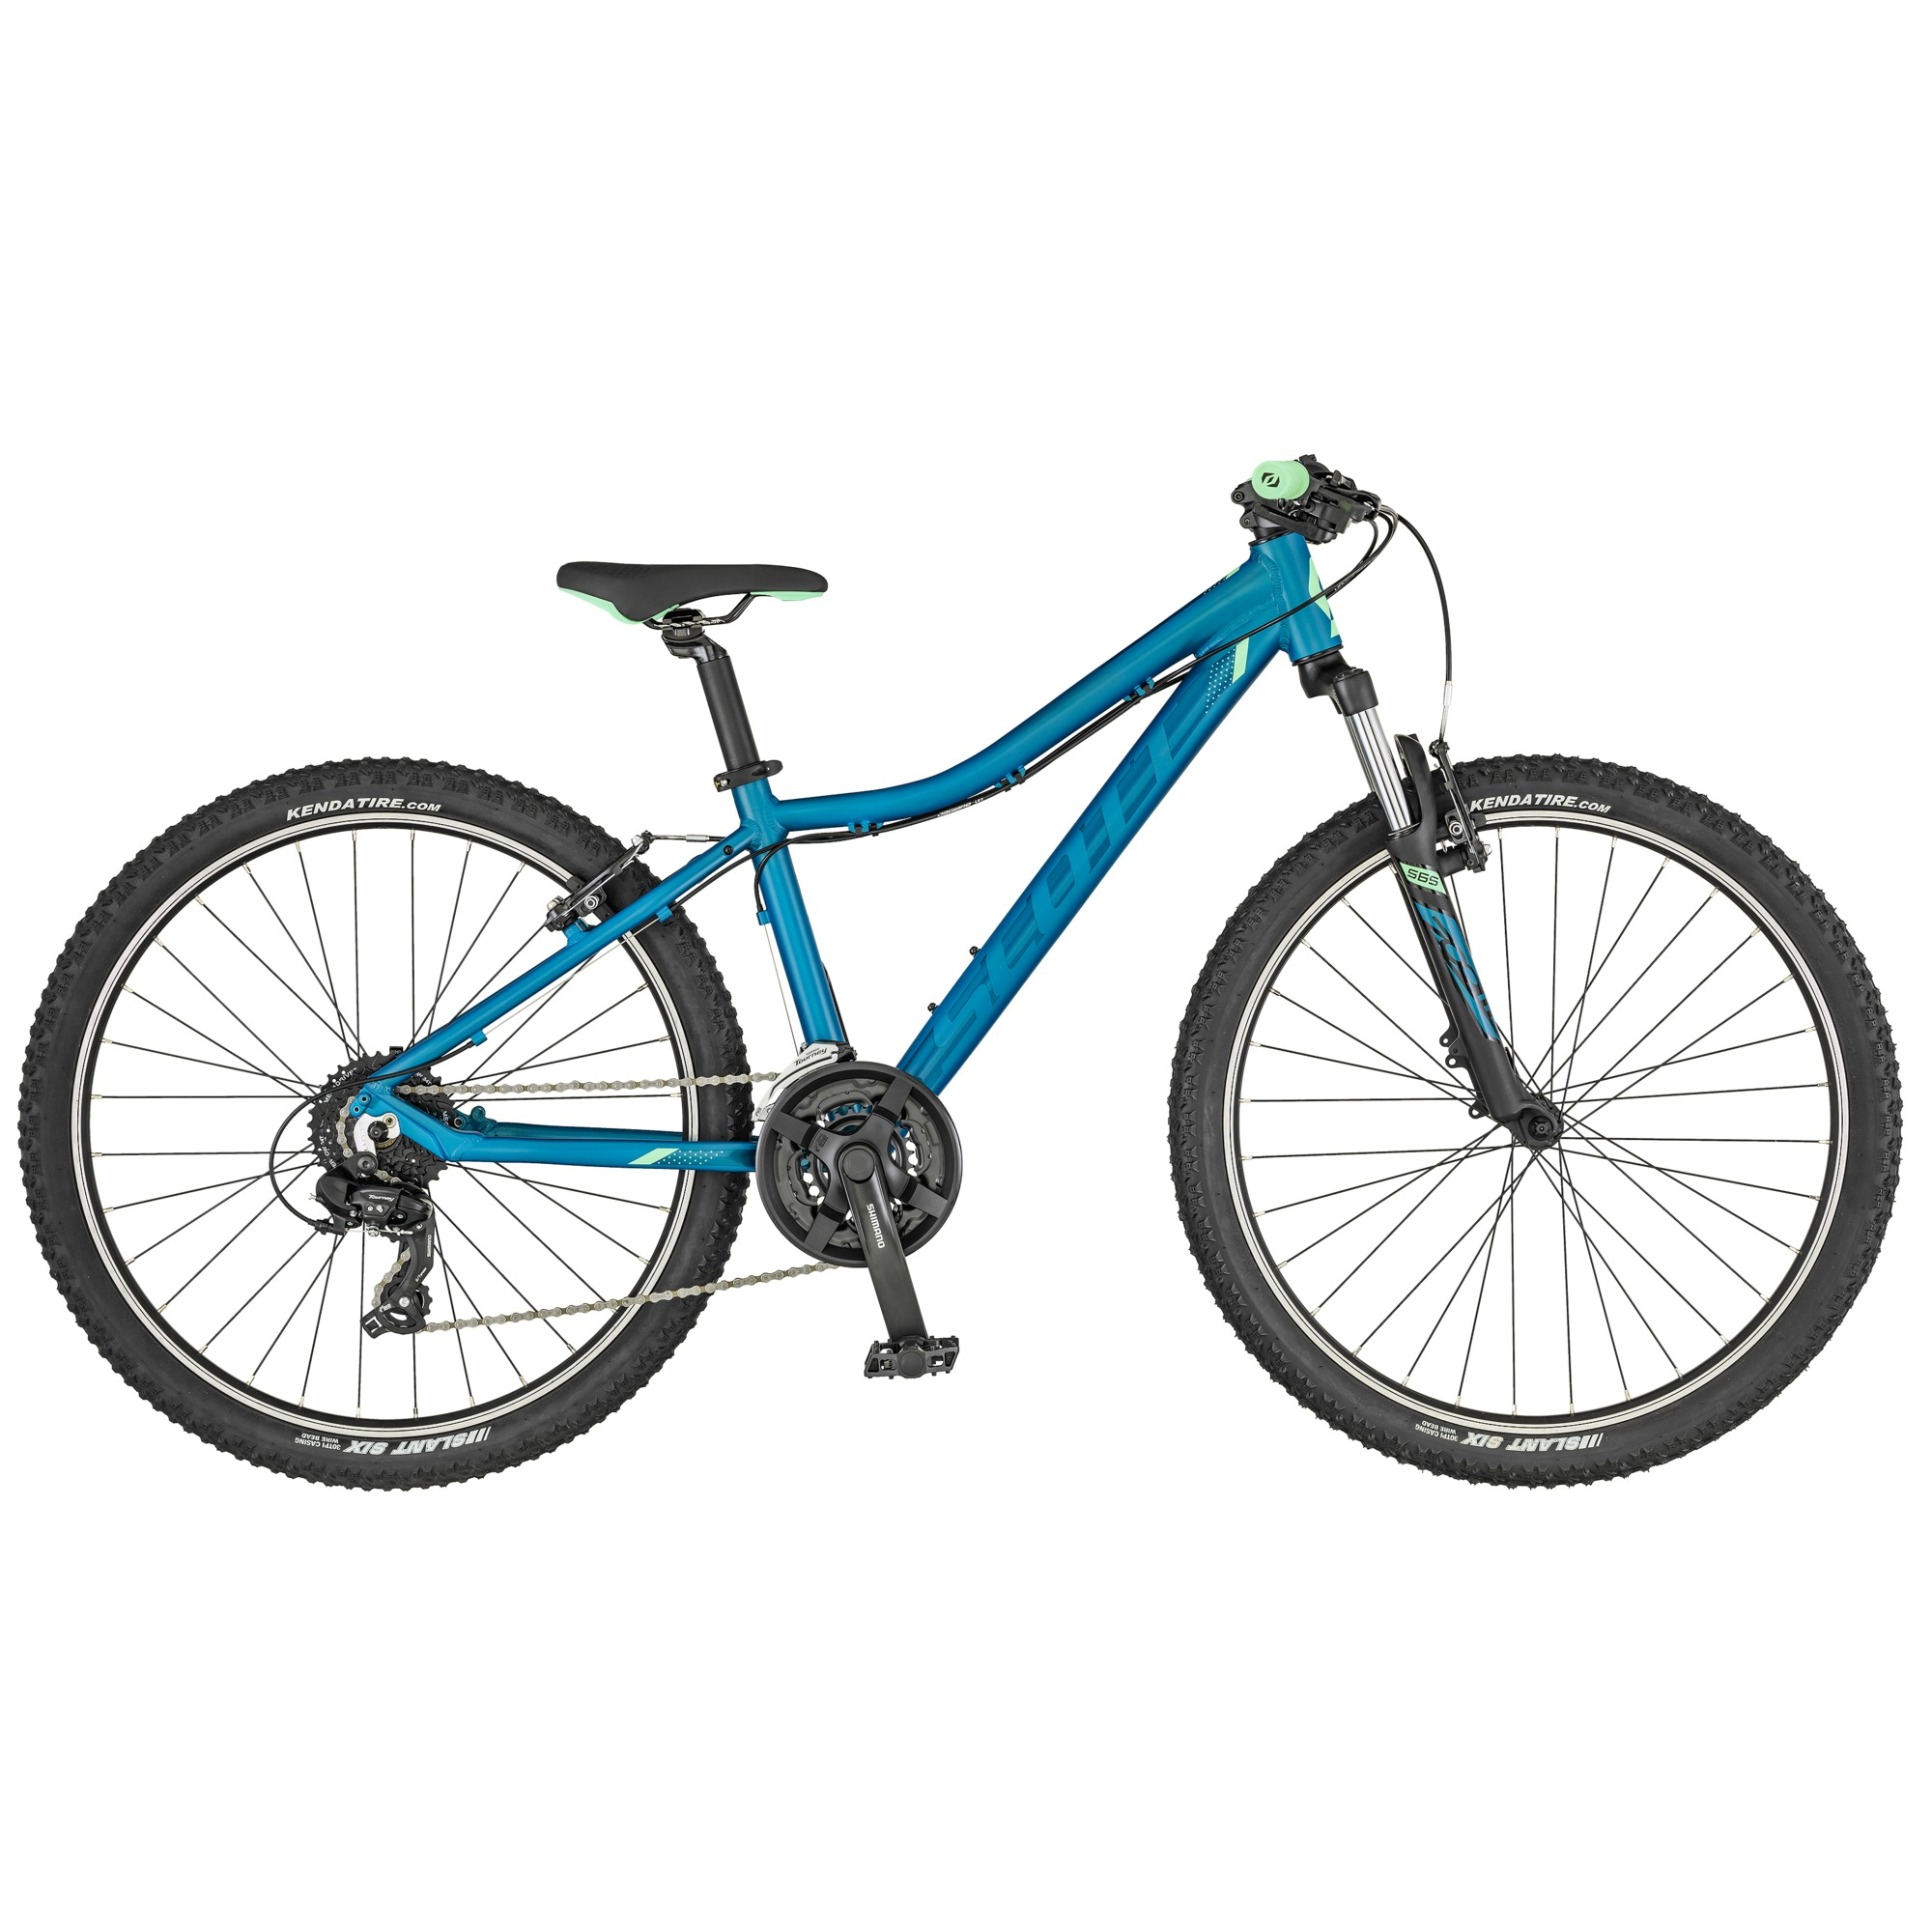 SCOTT Contessa 610 Bike S - Fahrrad online kaufen | Online Shop Bike Profis